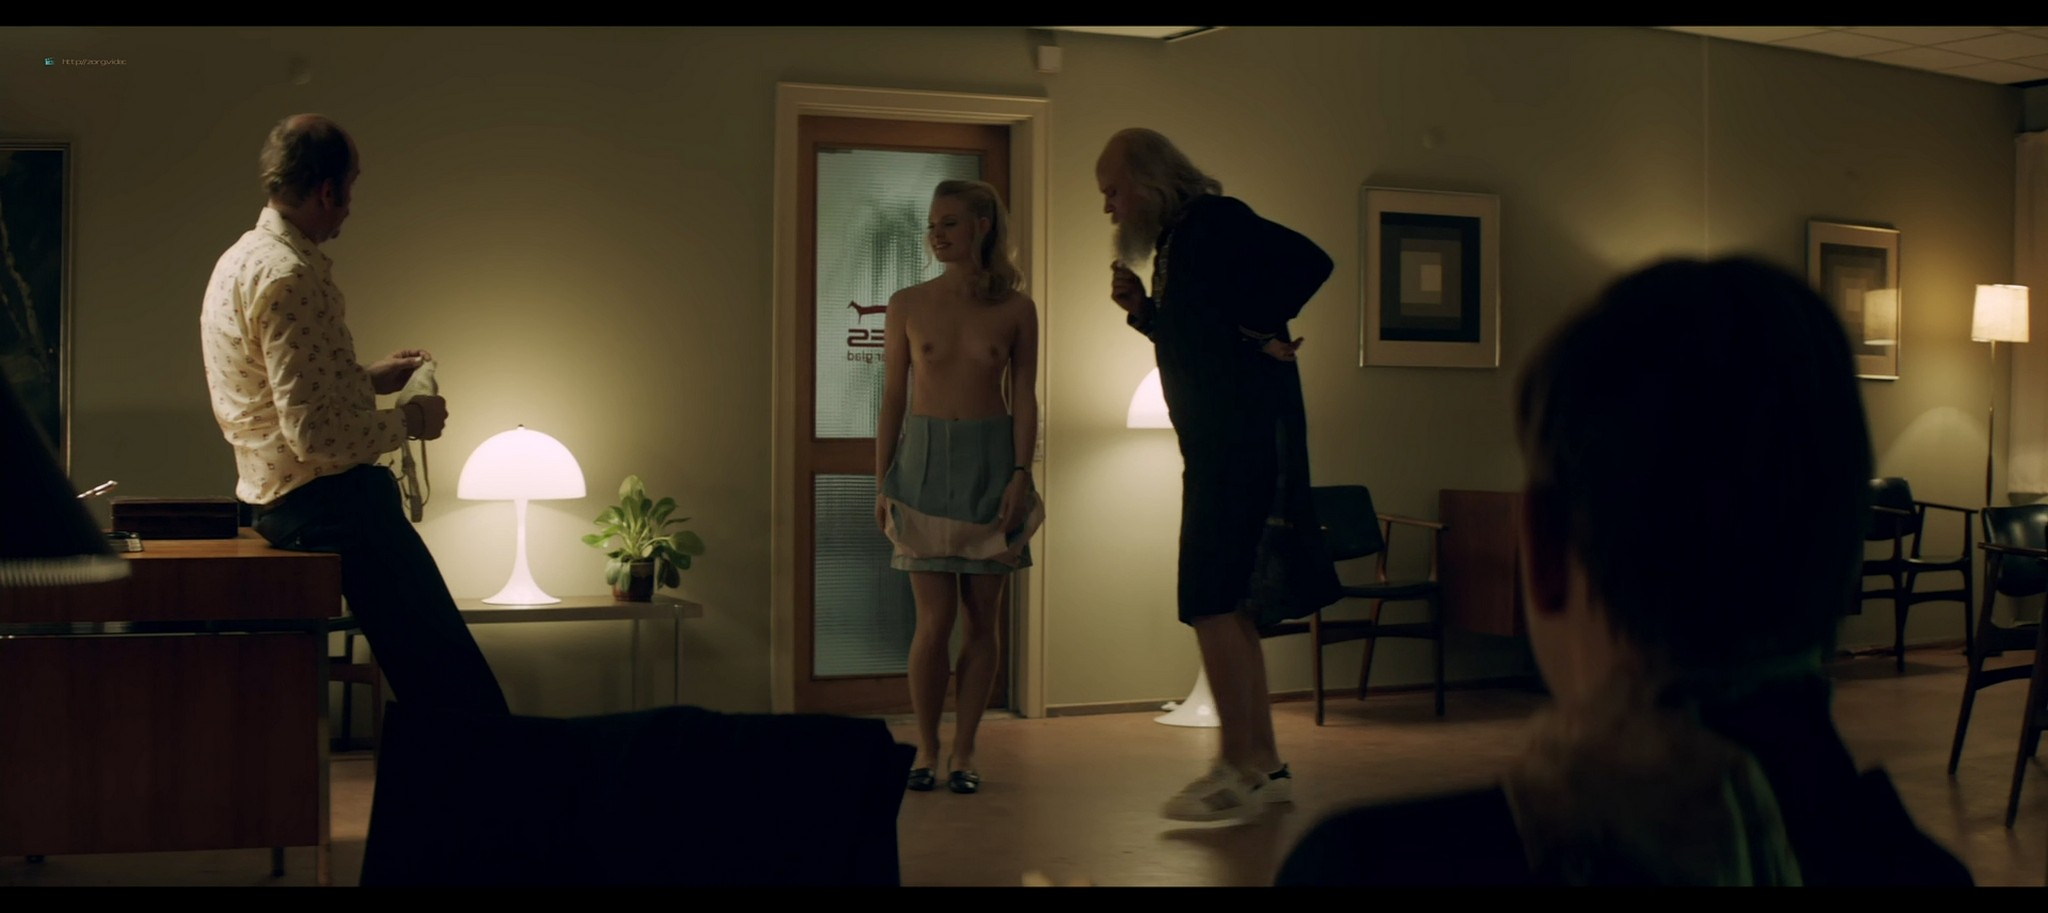 Camilla Cornelia Lehmann nude Sarahsita Lassen, nude and explicit body parts - Spies Og Glistrup (DK-2013) HD 1080p BluRay (8)